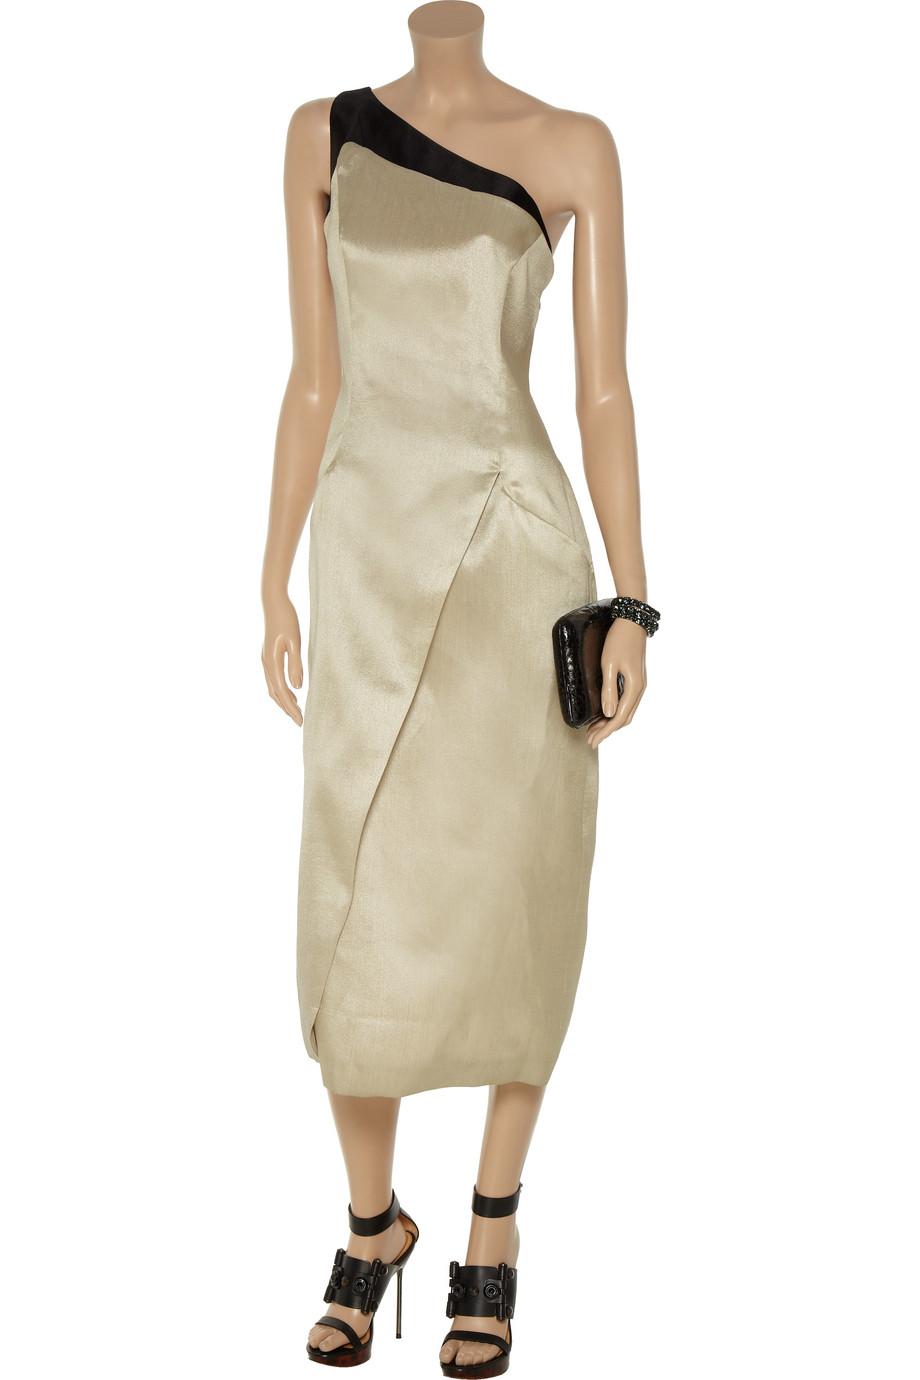 Giorgio Armani Metallicwoven Oneshoulder Dress In Metallic